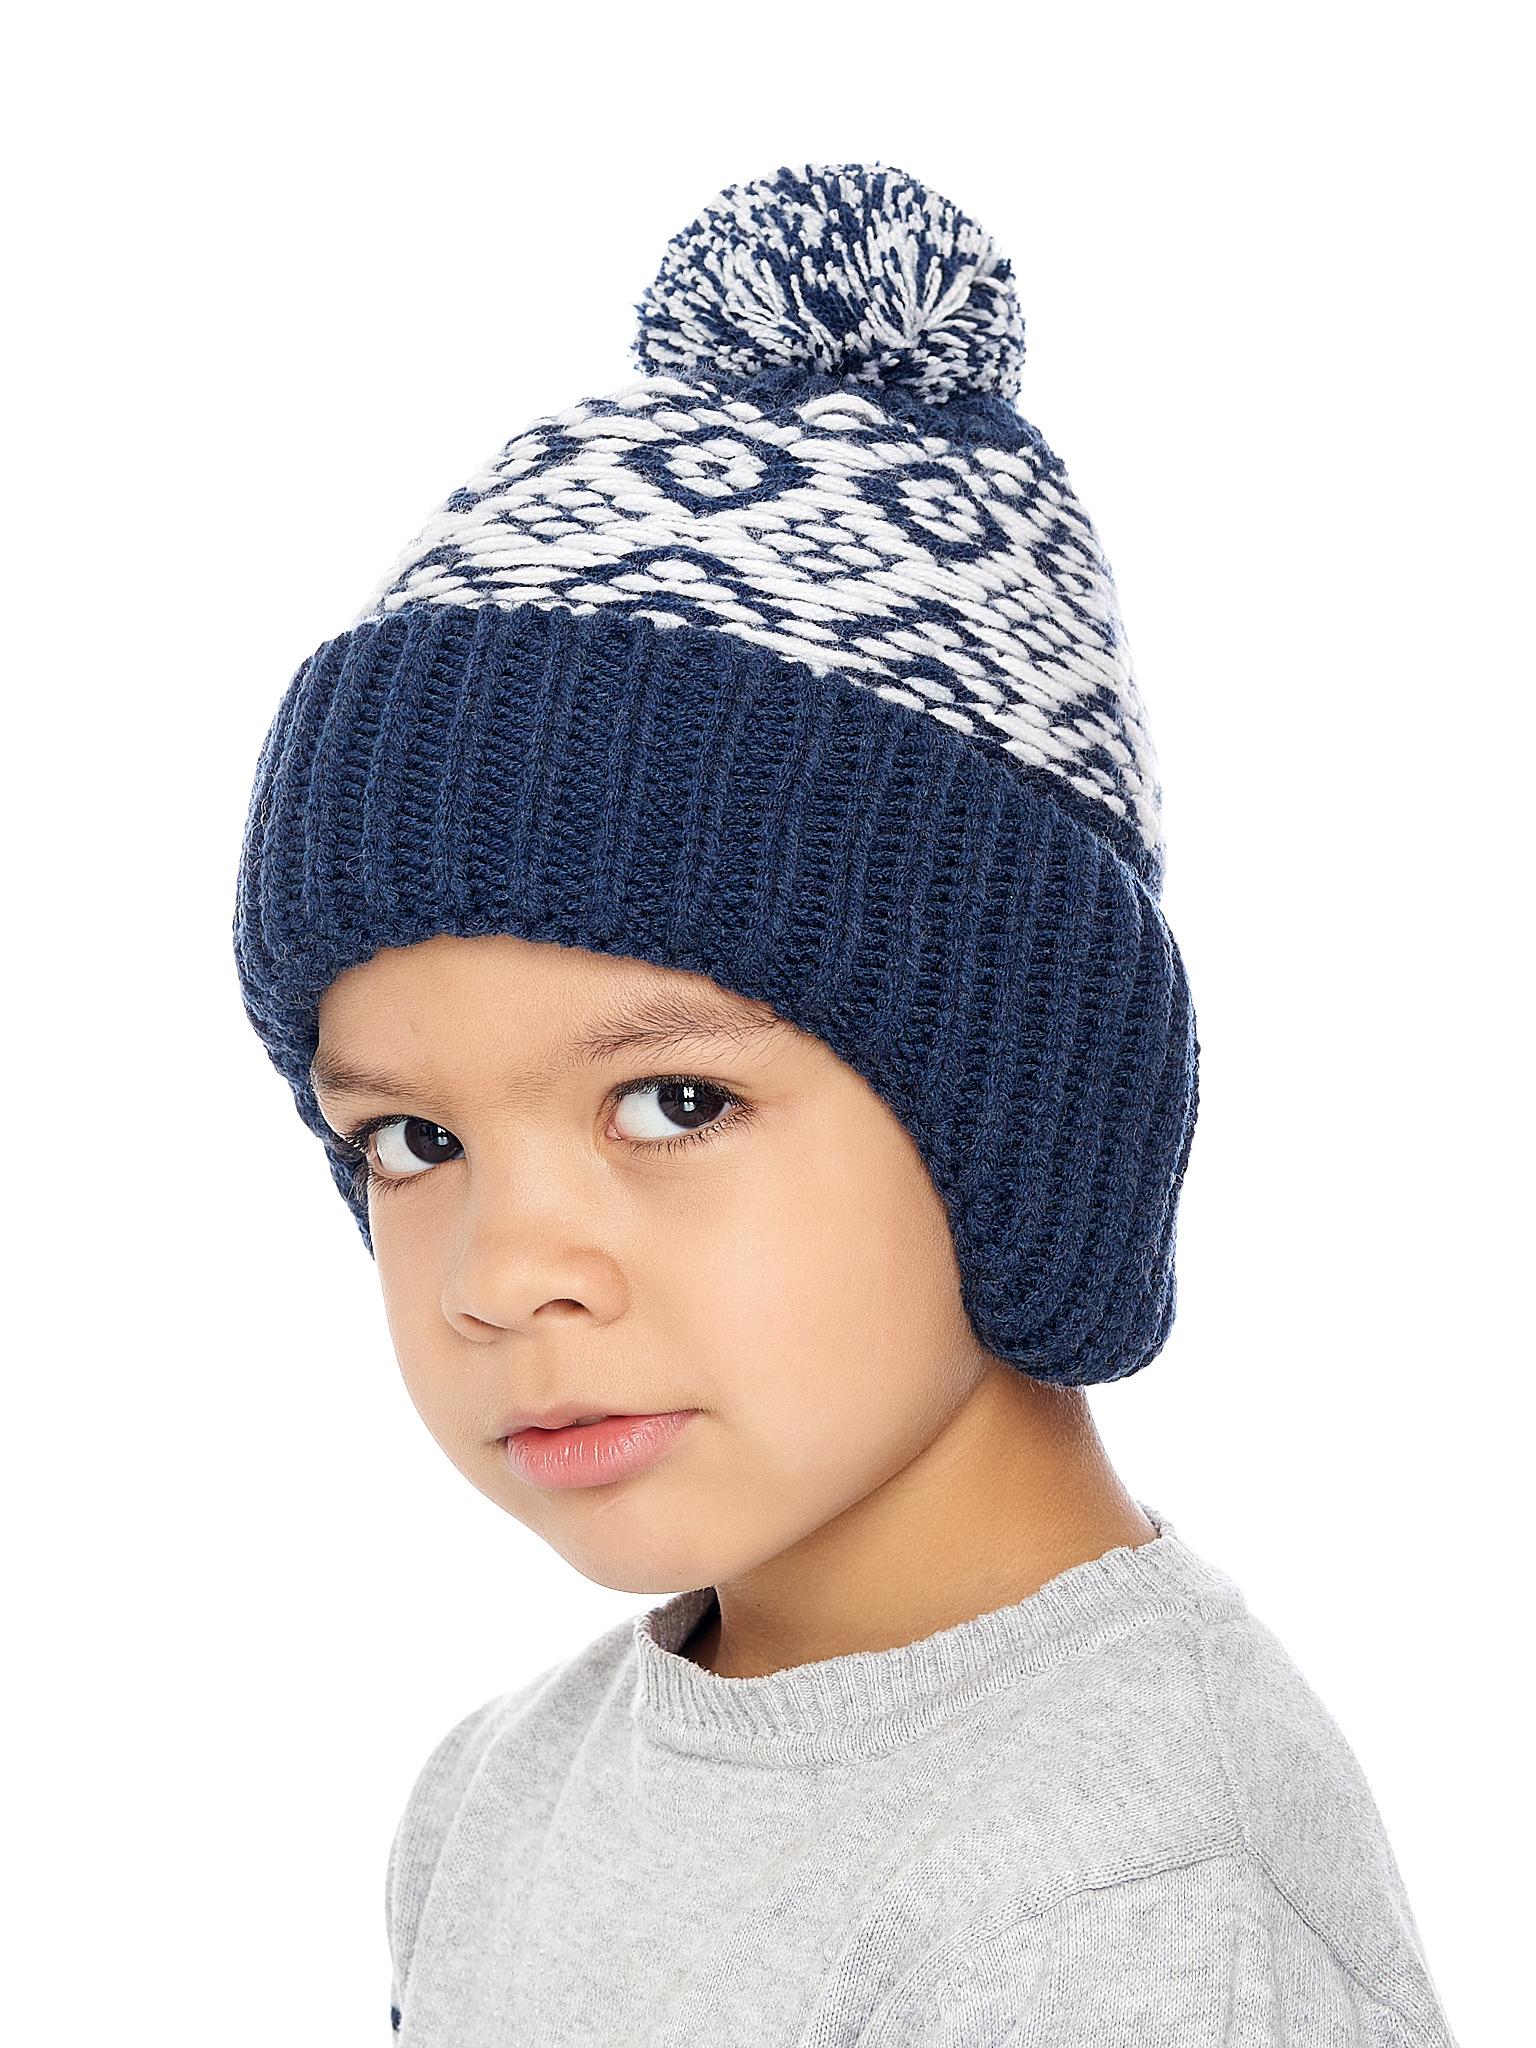 Chlapecká pletená čepice Ušanka NAVY Navy/Bílá